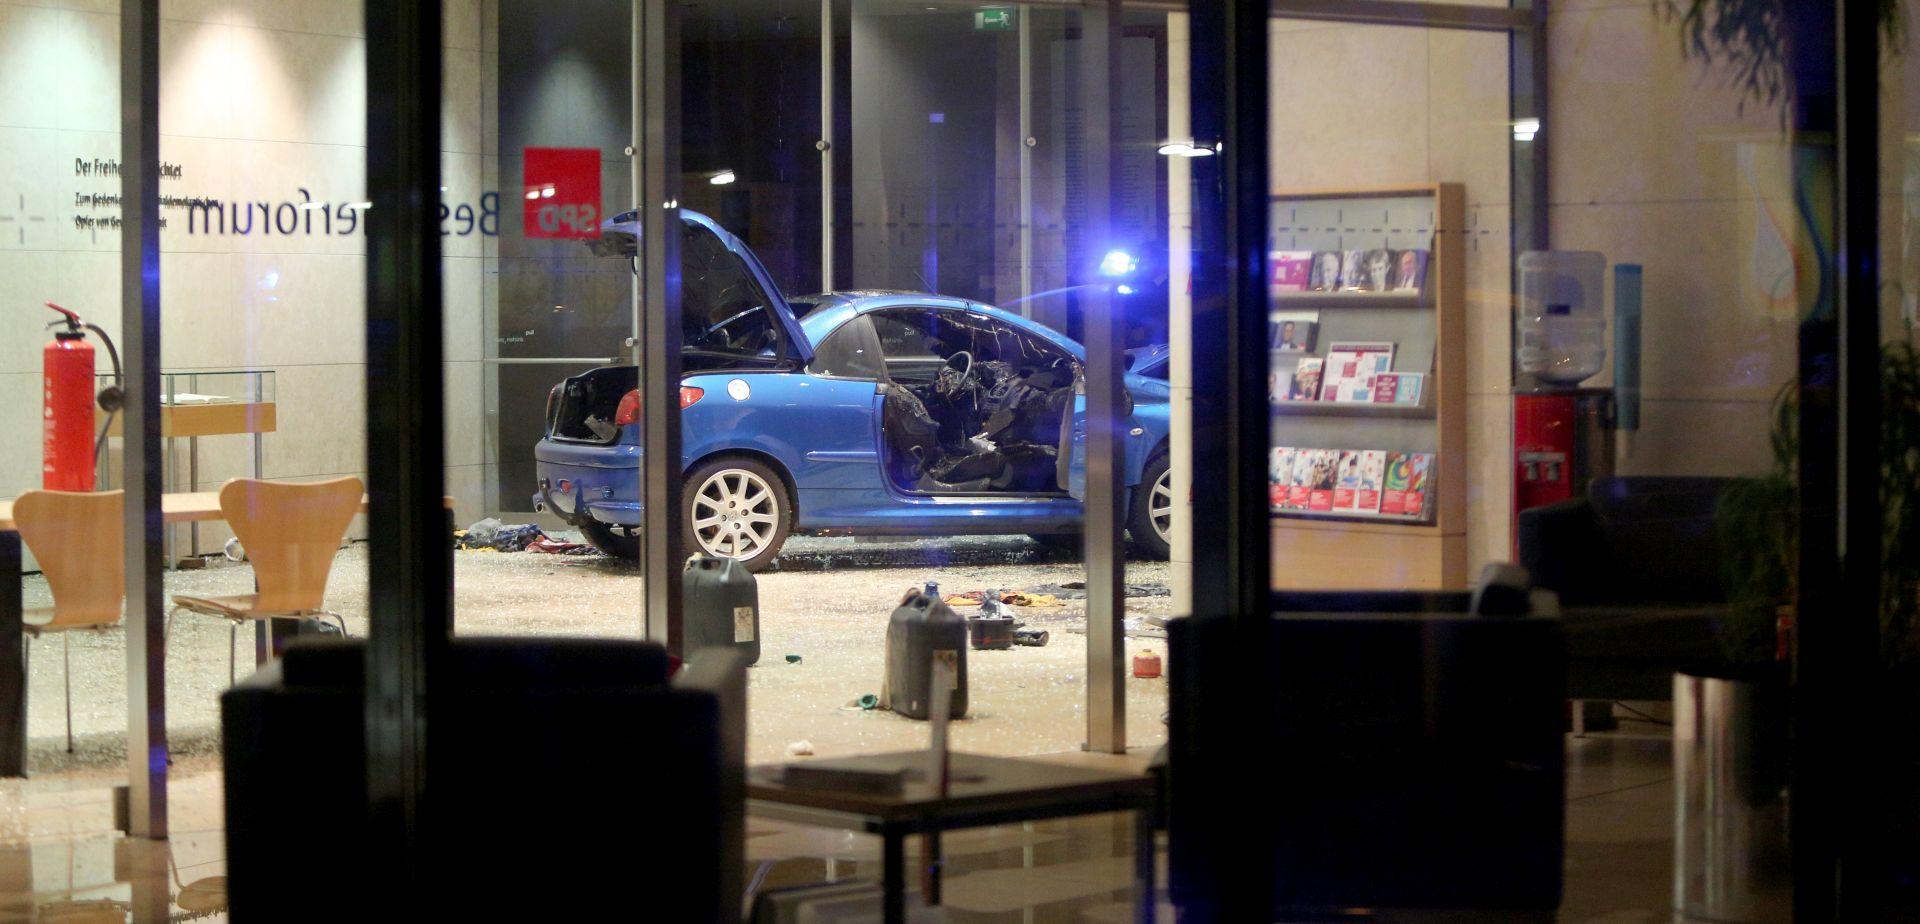 BERLIN Muškarac se zaletio automobilom u sjedište SPD-a